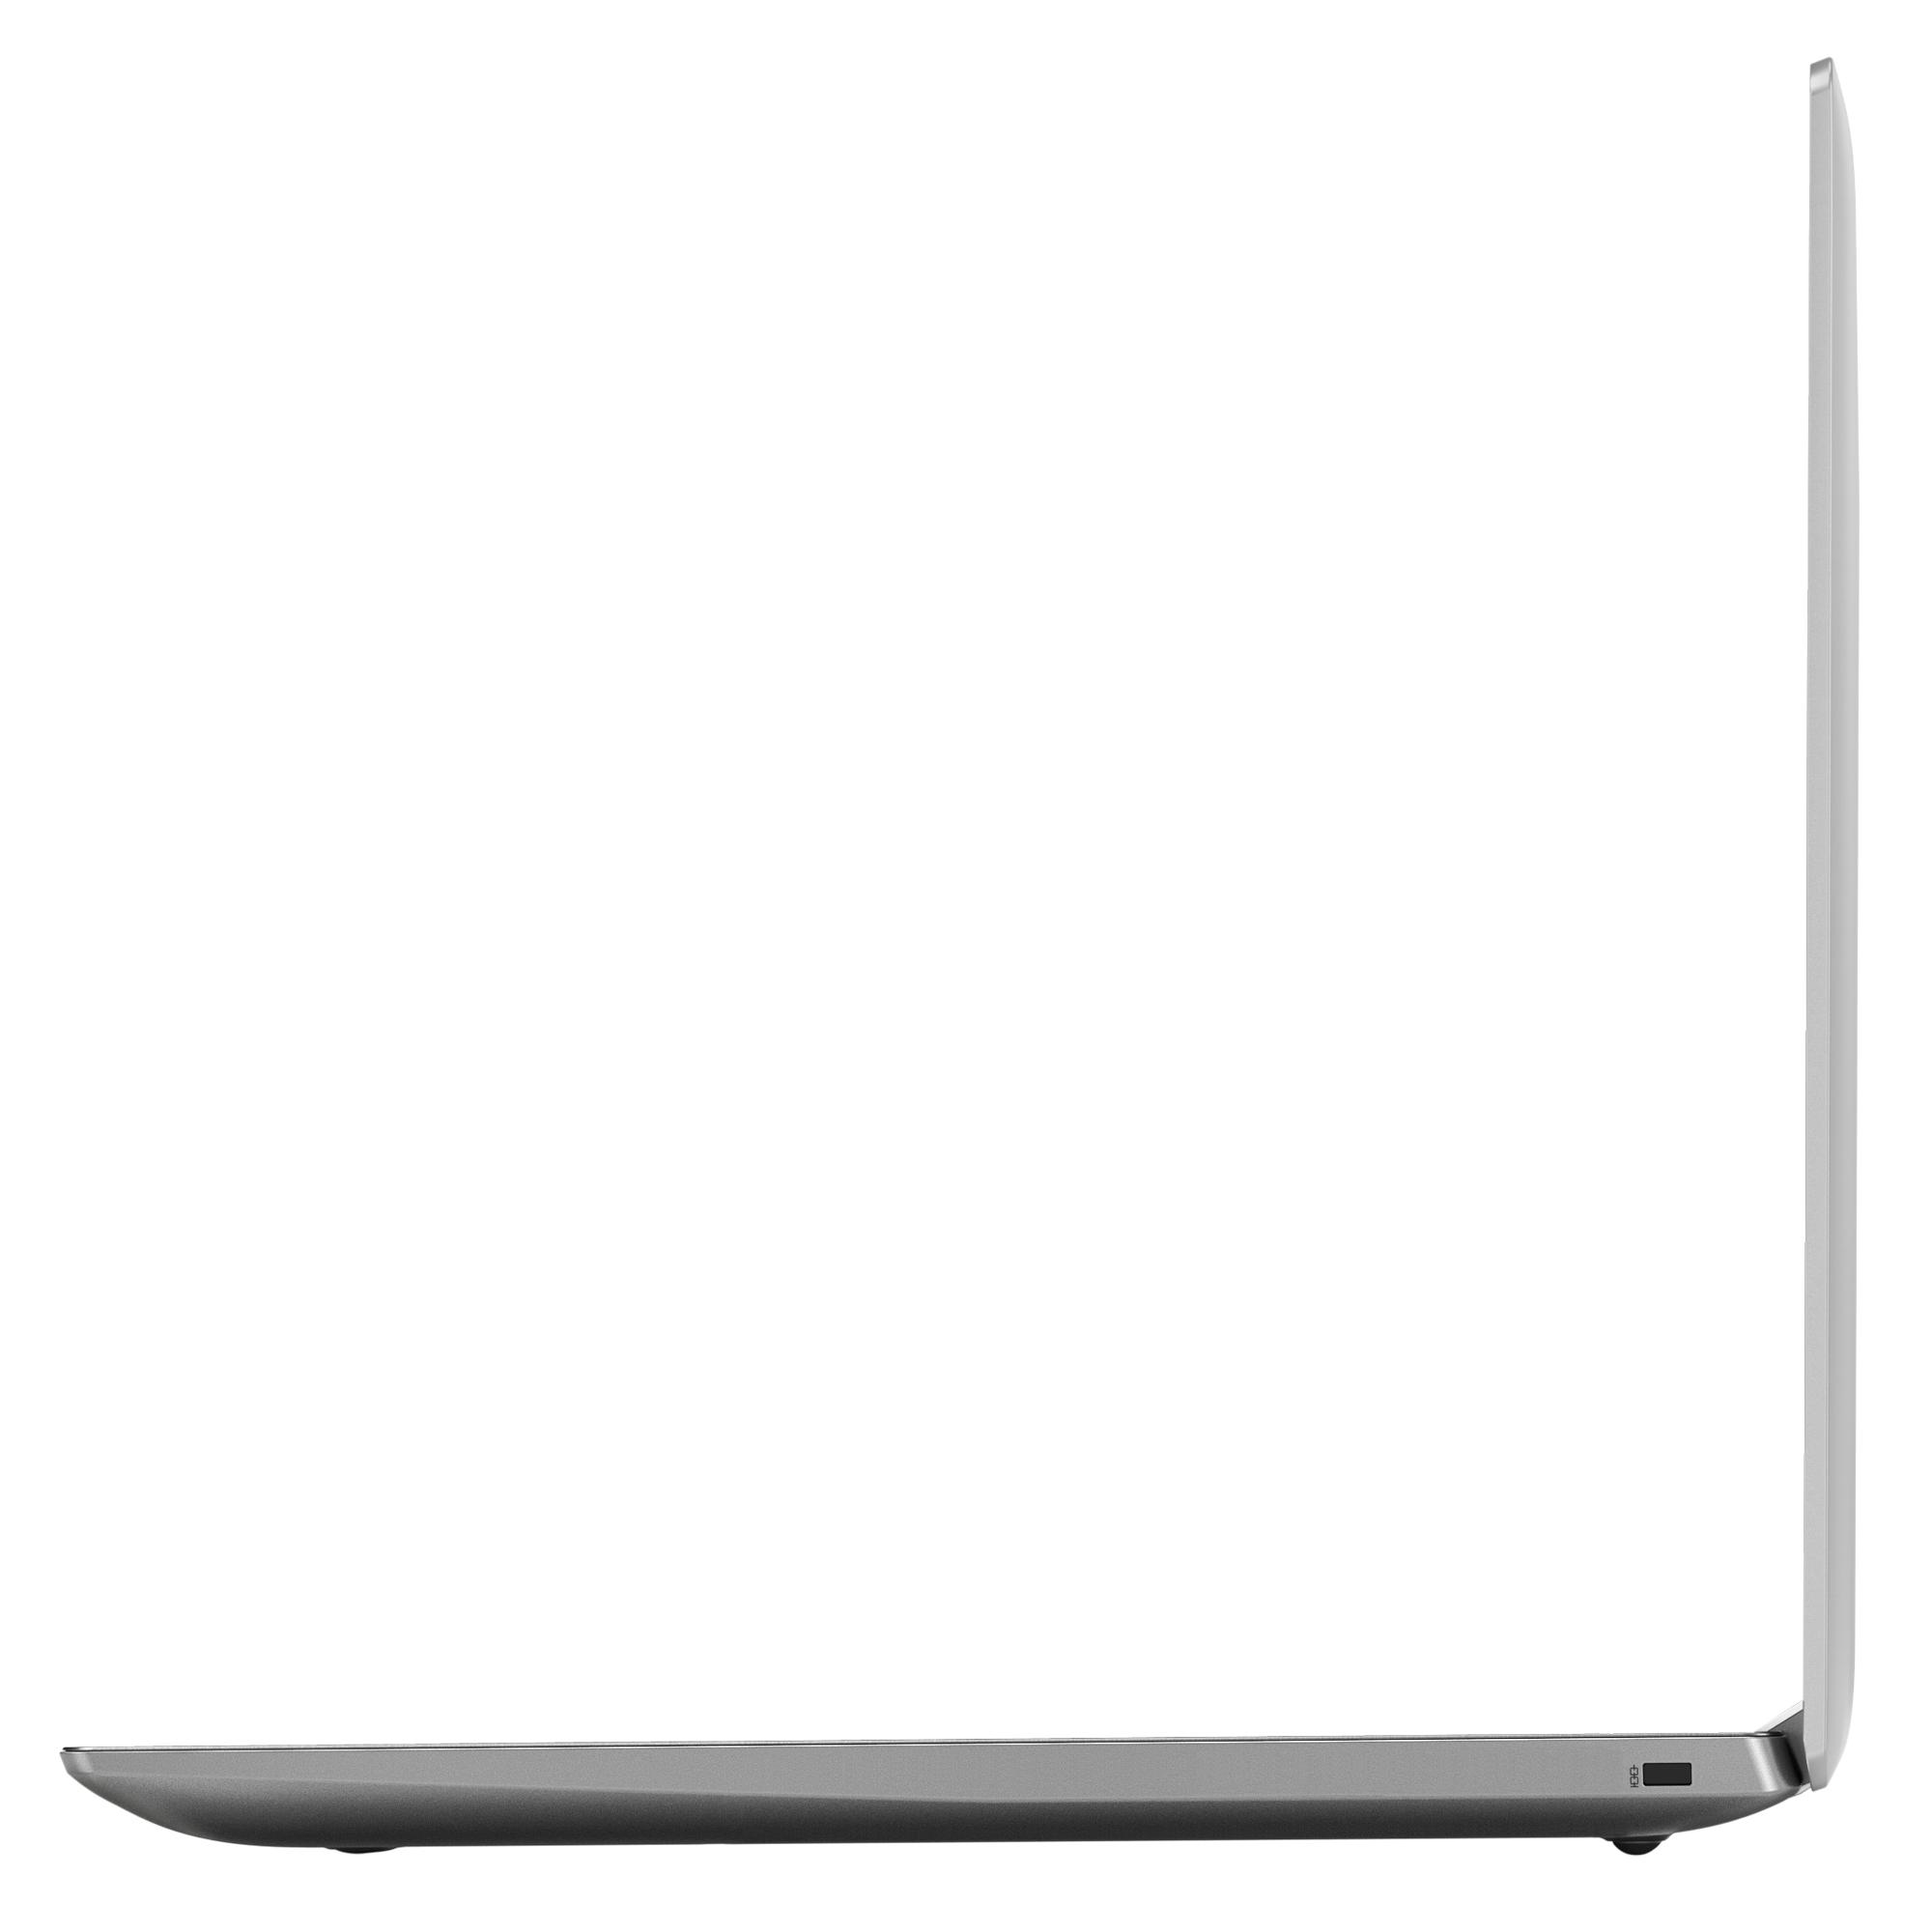 Фото  Ноутбук Lenovo ideapad 330-15IKB Platinum Grey (81DC007GRU)